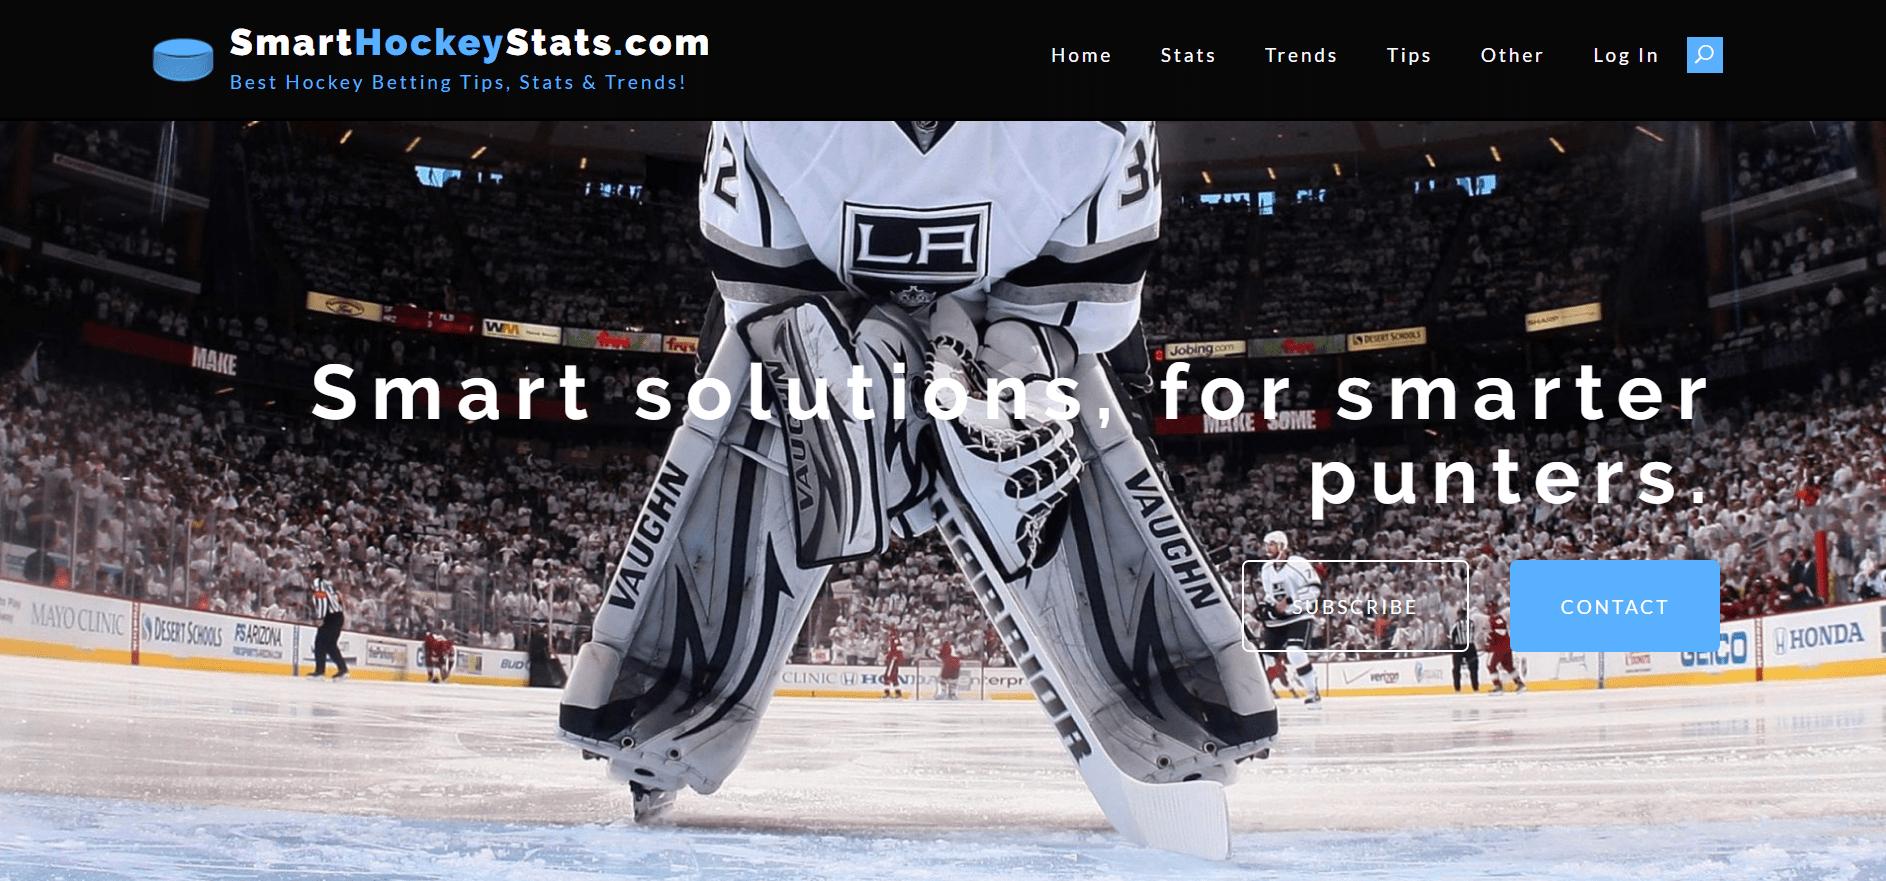 Smart Hockey Stats